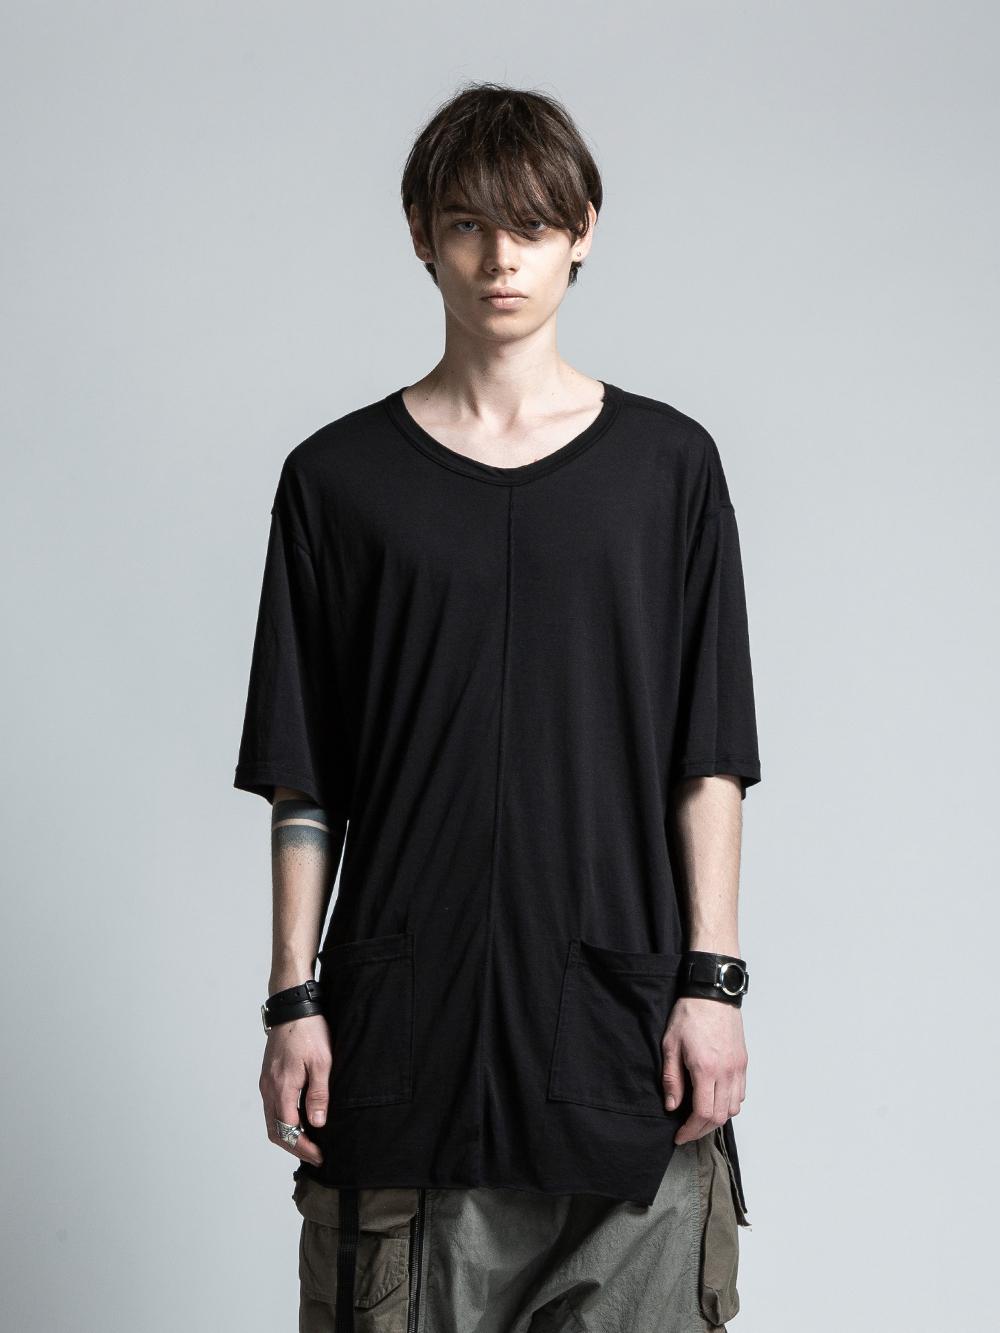 VI-3071-01 / コットンシルク 裾ポケット ロング丈五分袖カットソー